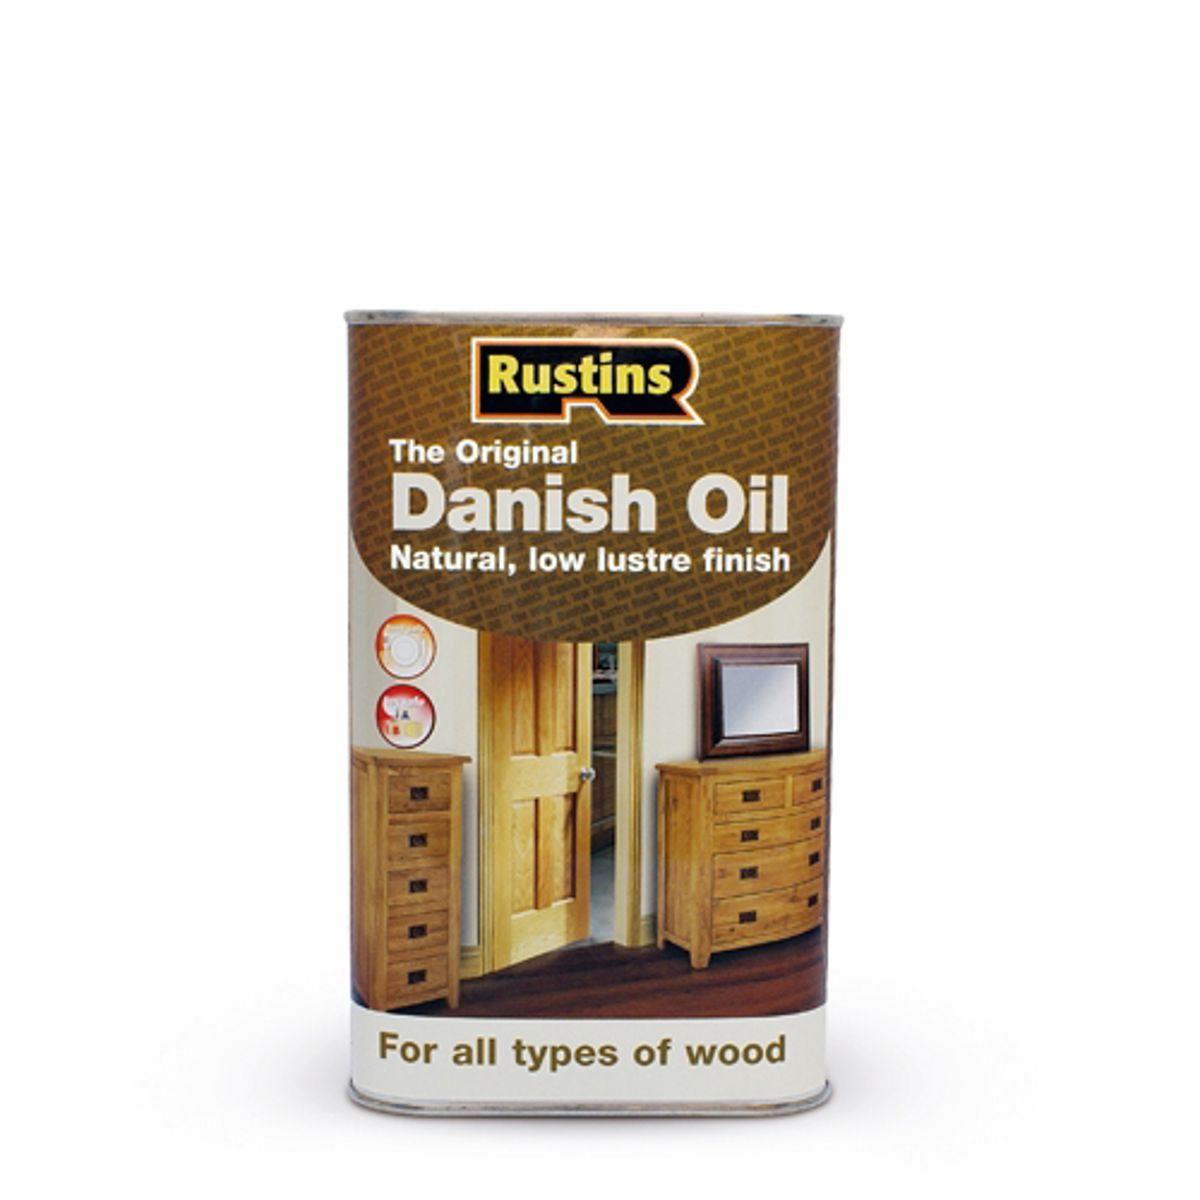 Rustin's danish oil 5 liter